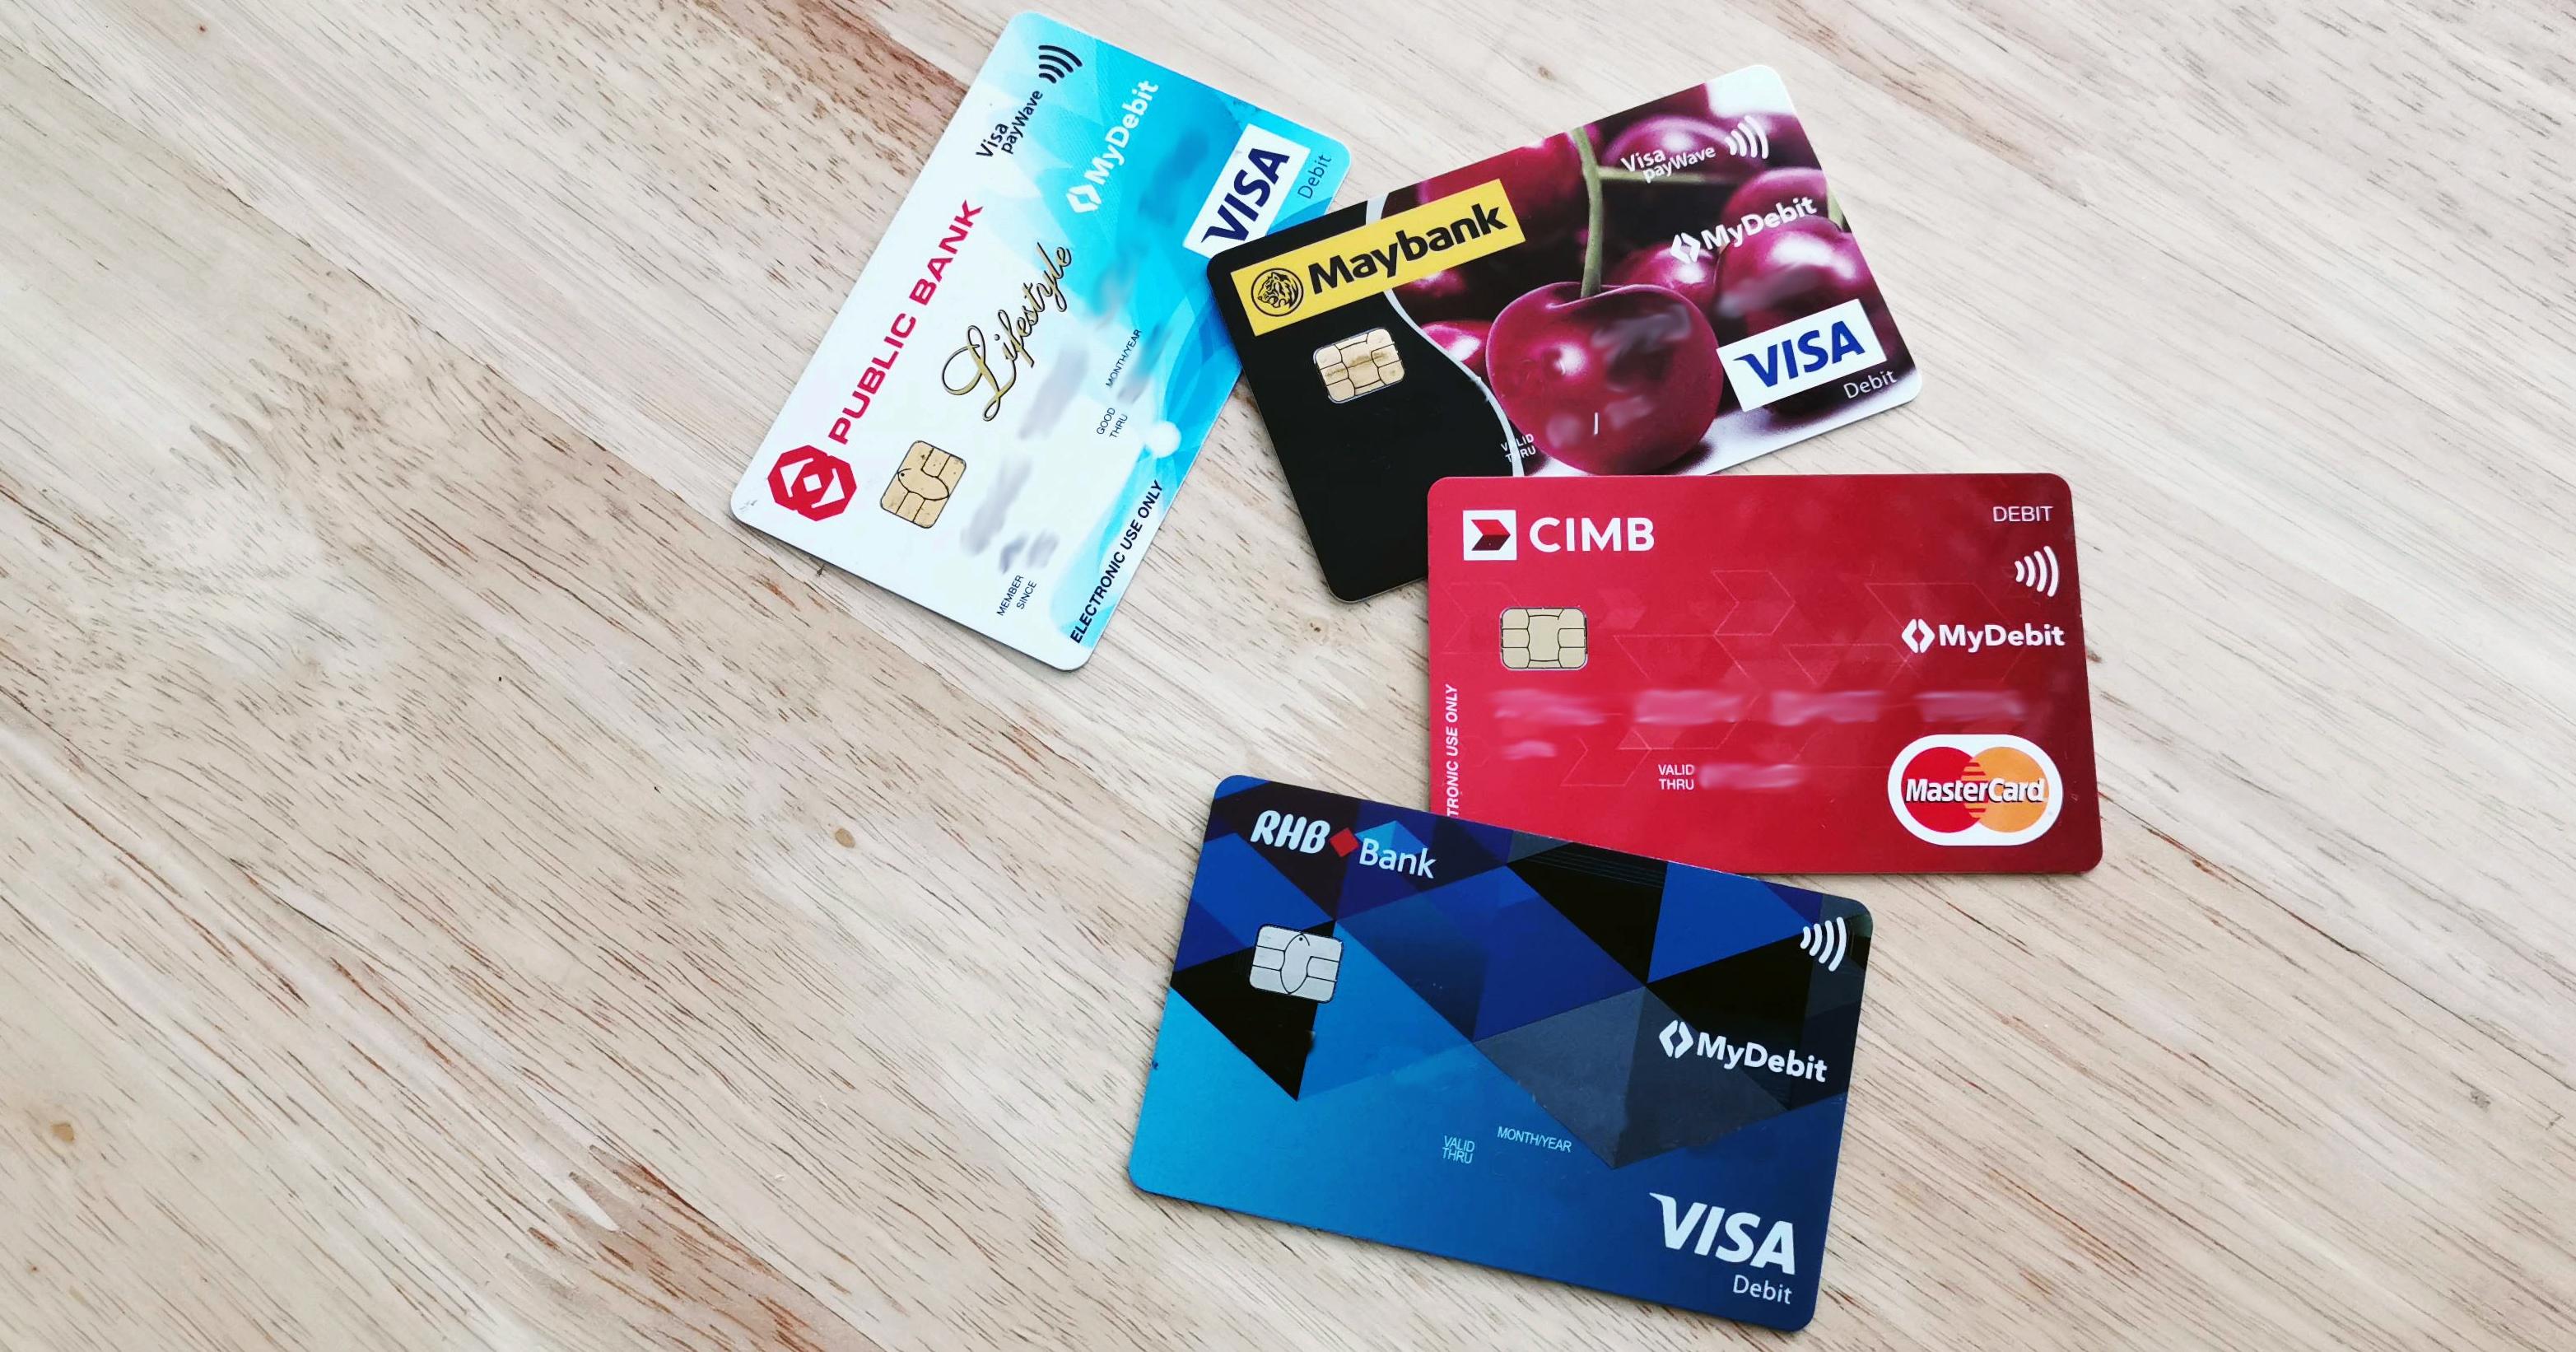 Singapore debit cards